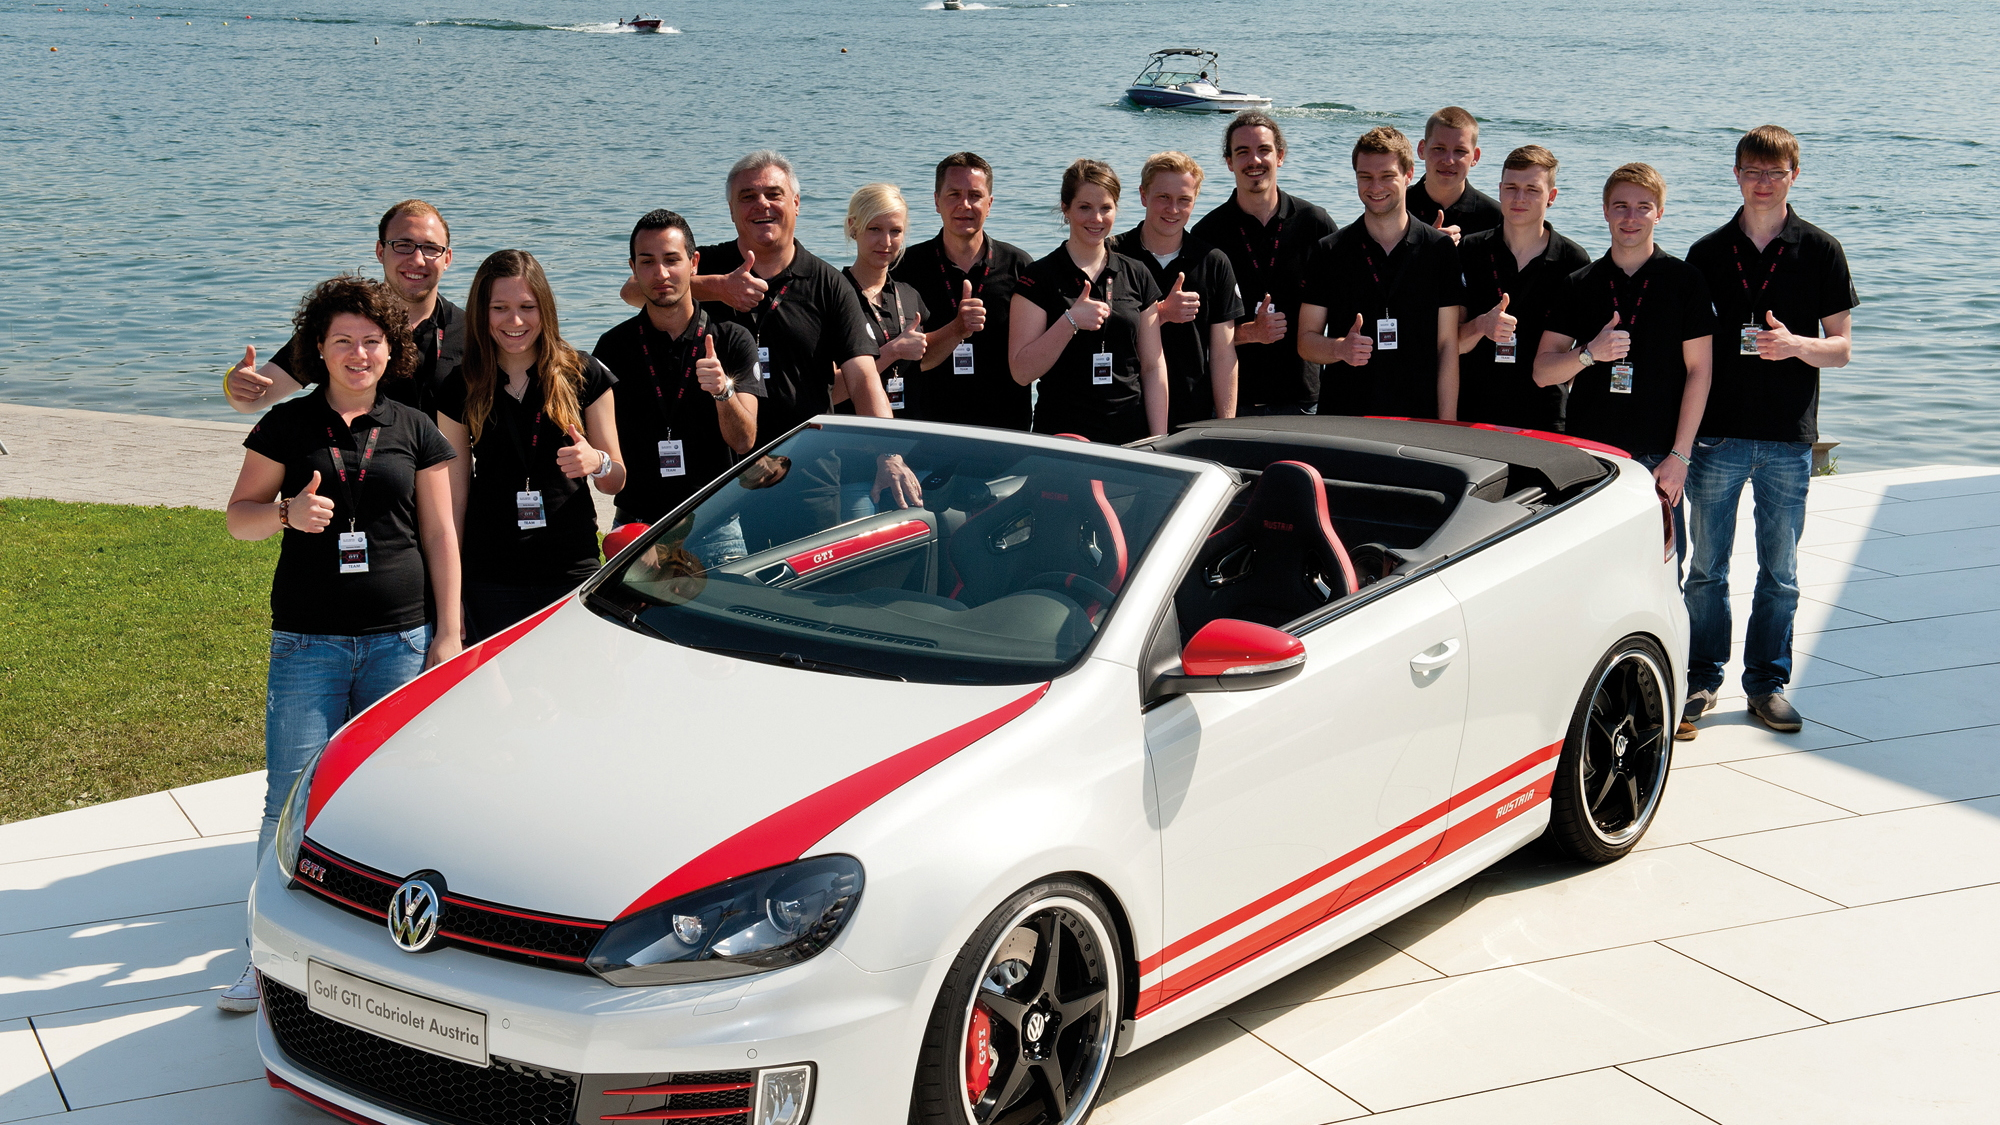 Apprentice-Built Wörthersee VW Golf GTI Cabrio